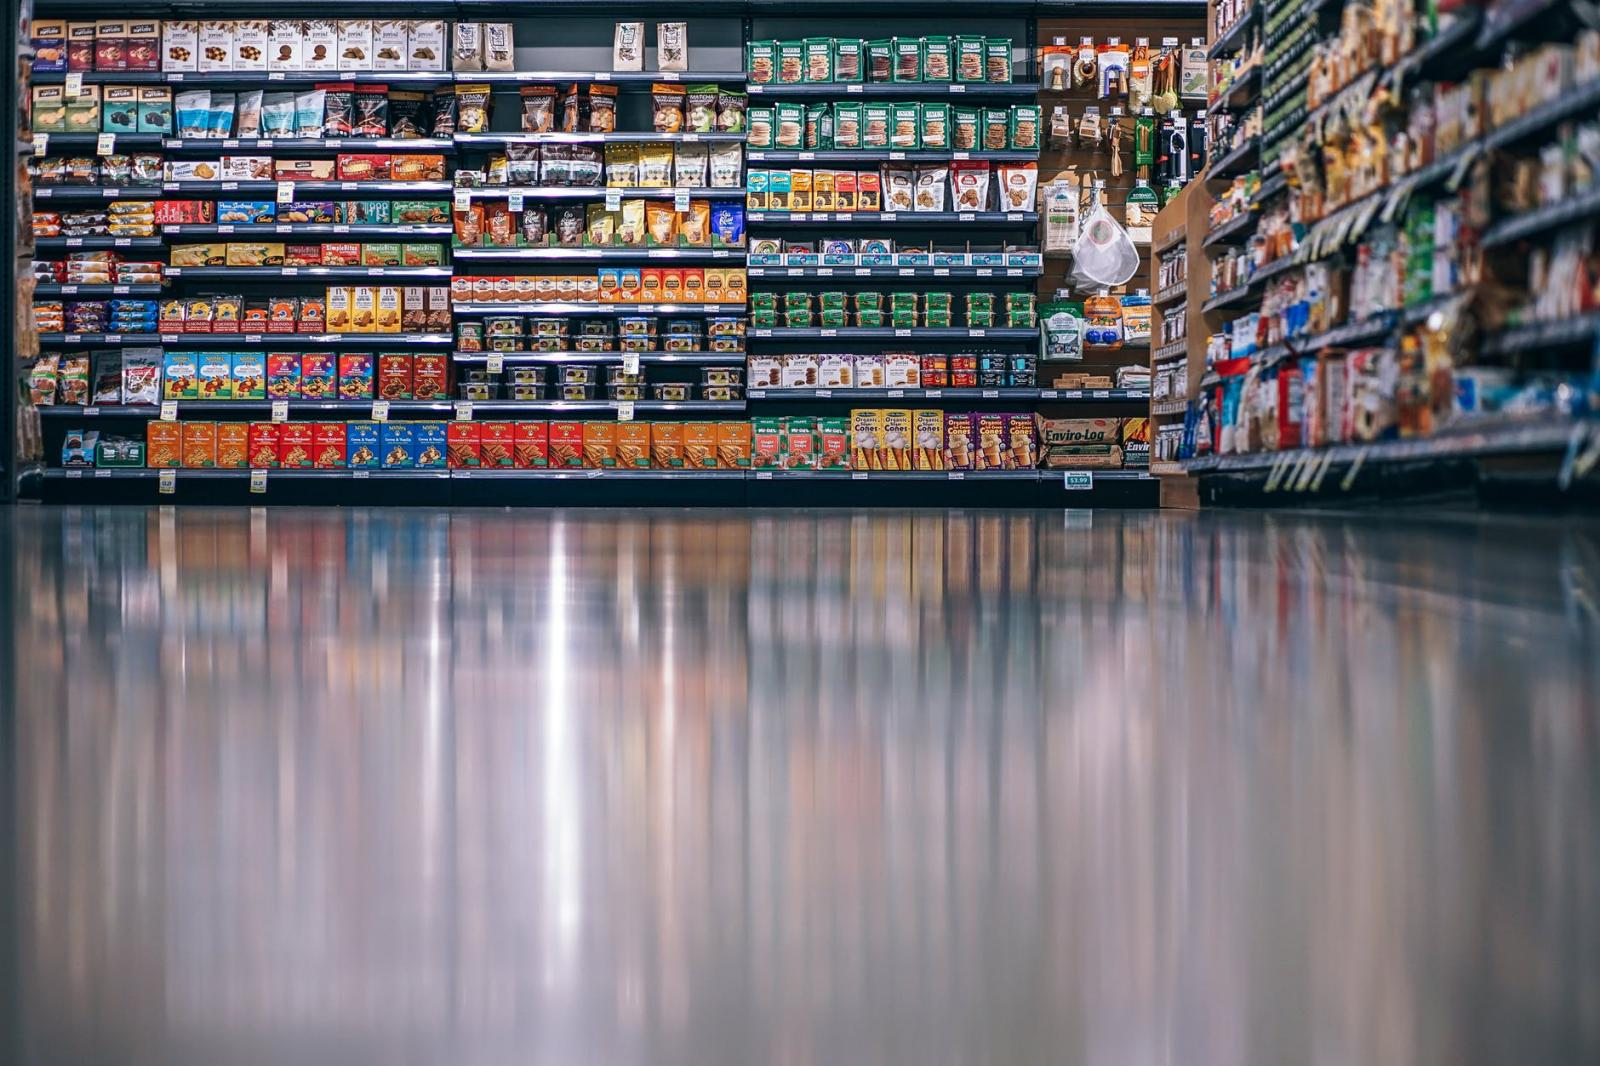 Heart-Healthy Grocery Listings